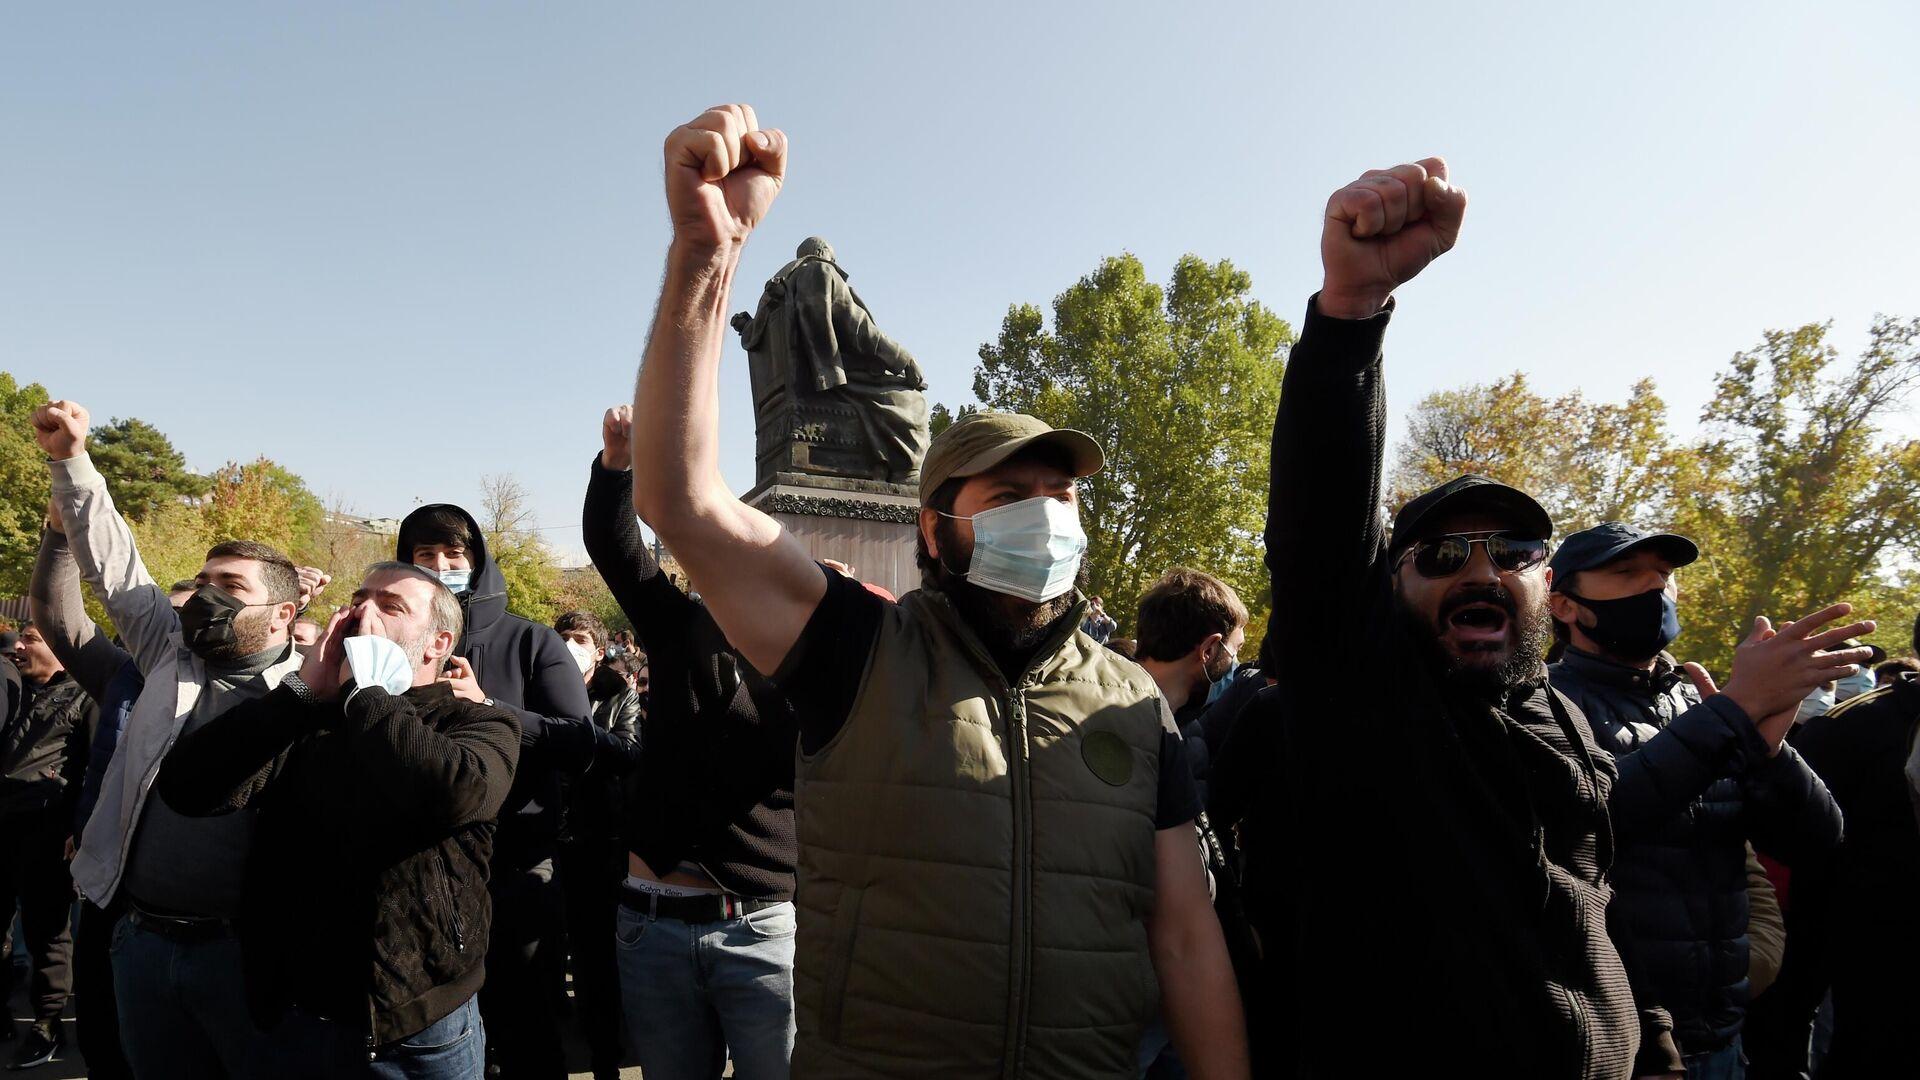 Участники митинга на площади Свободы в Ереване - РИА Новости, 1920, 05.12.2020